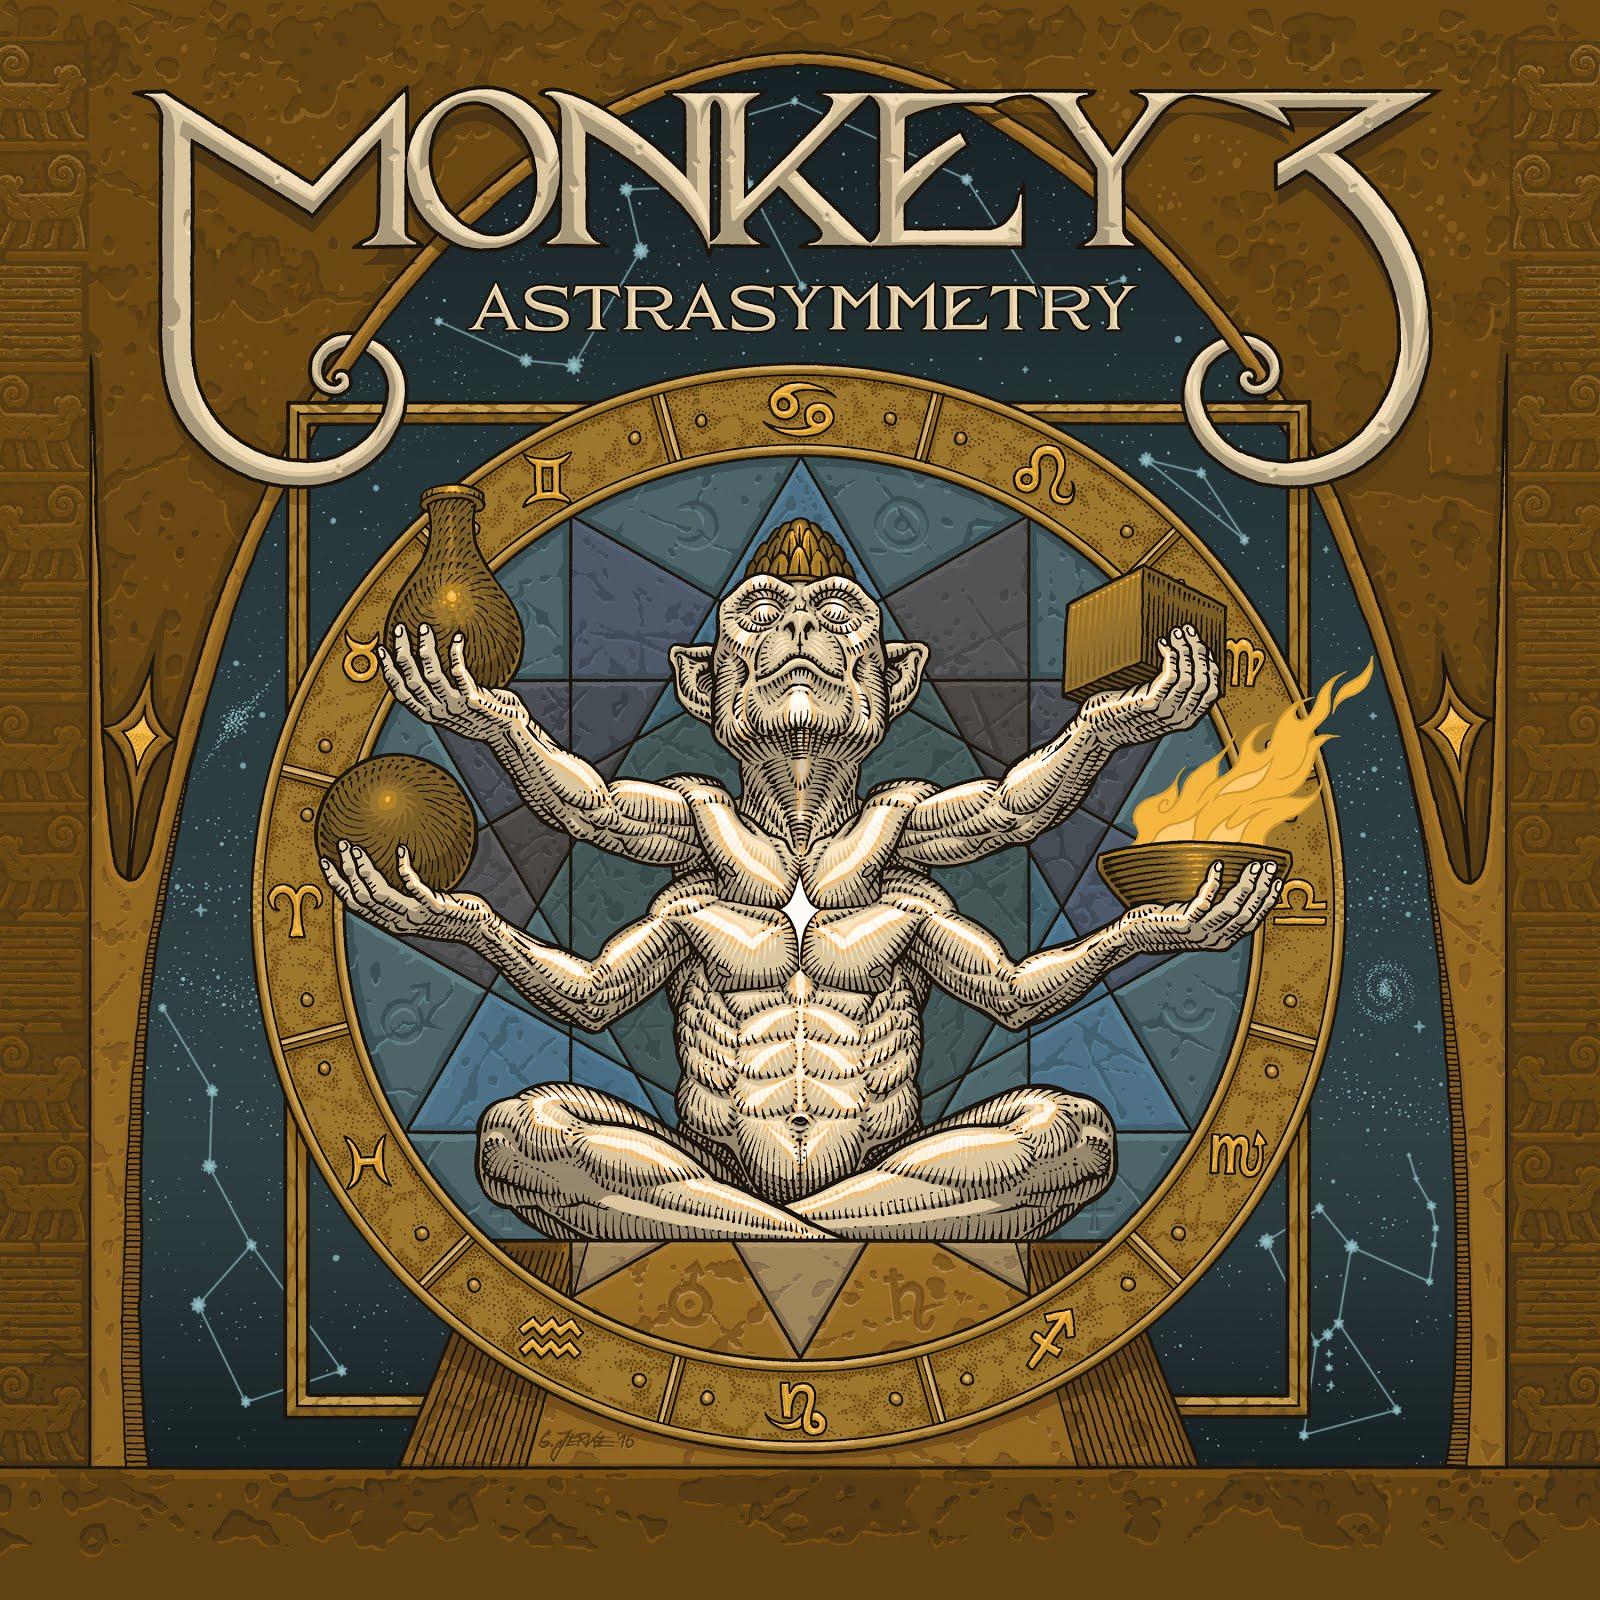 Monkey3: Astra Symmetry